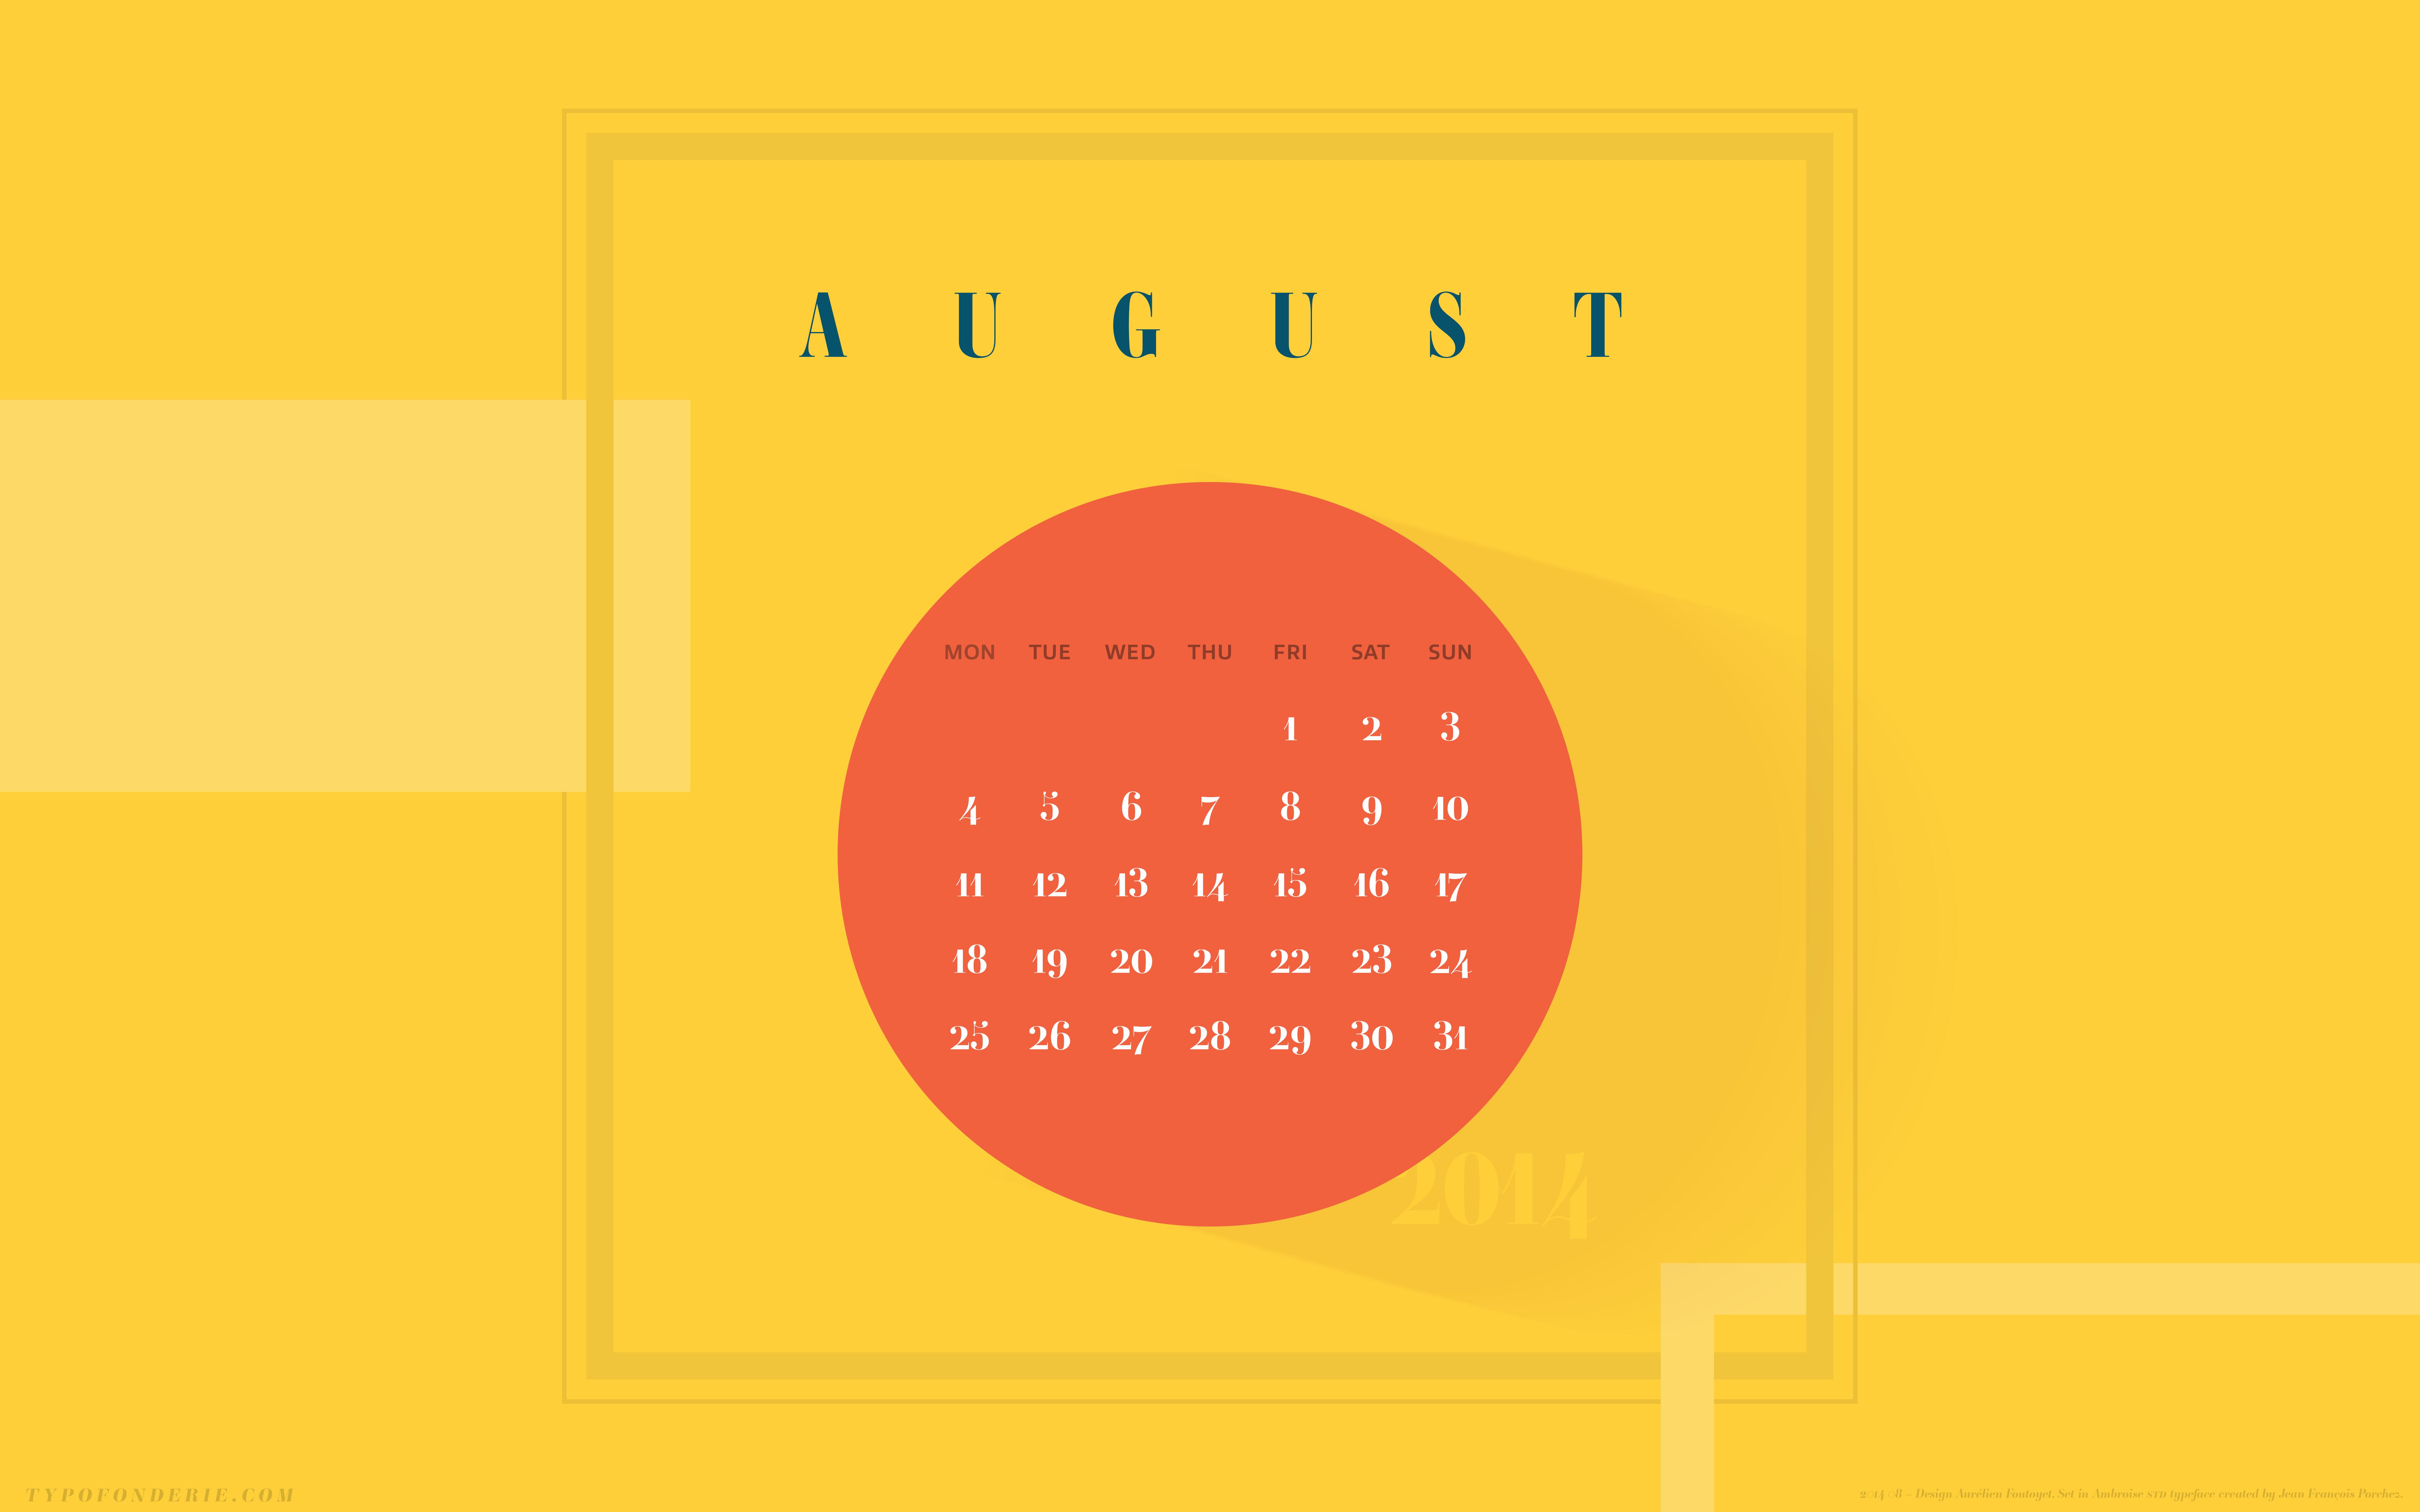 A wallpaper calendar August 2014 featuring Ambroise Typofonderie 8000x5000